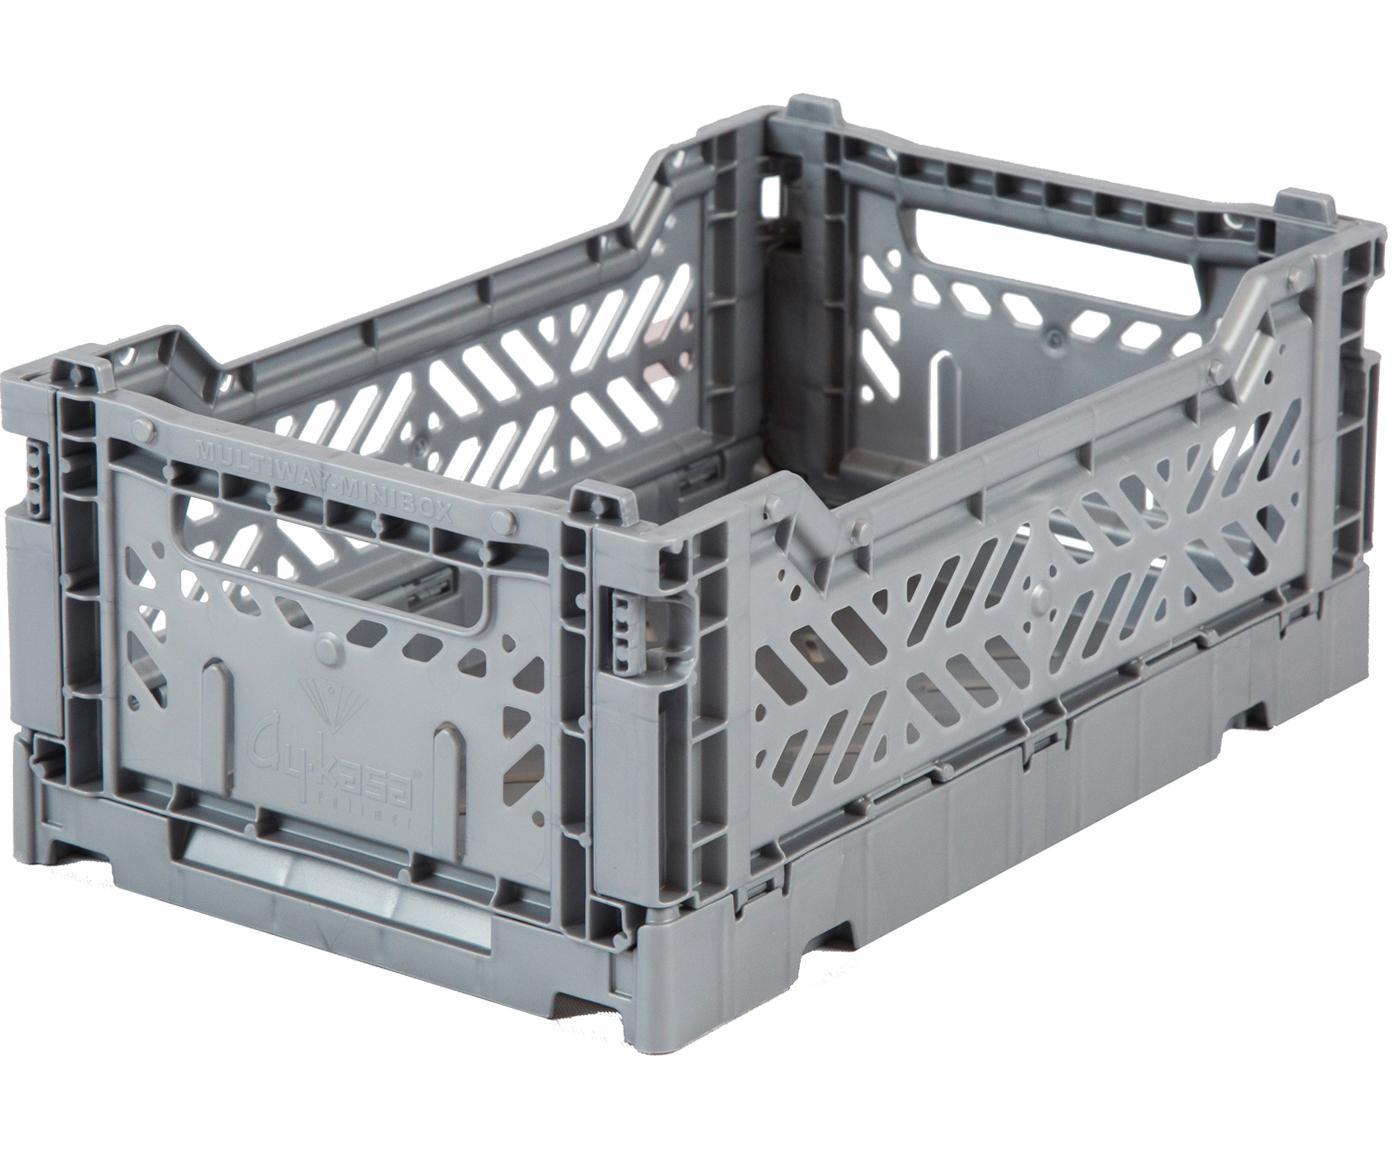 Klappkiste Grey, stapelbar, klein, Recycelter Kunststoff, Grau, 27 x 11 cm